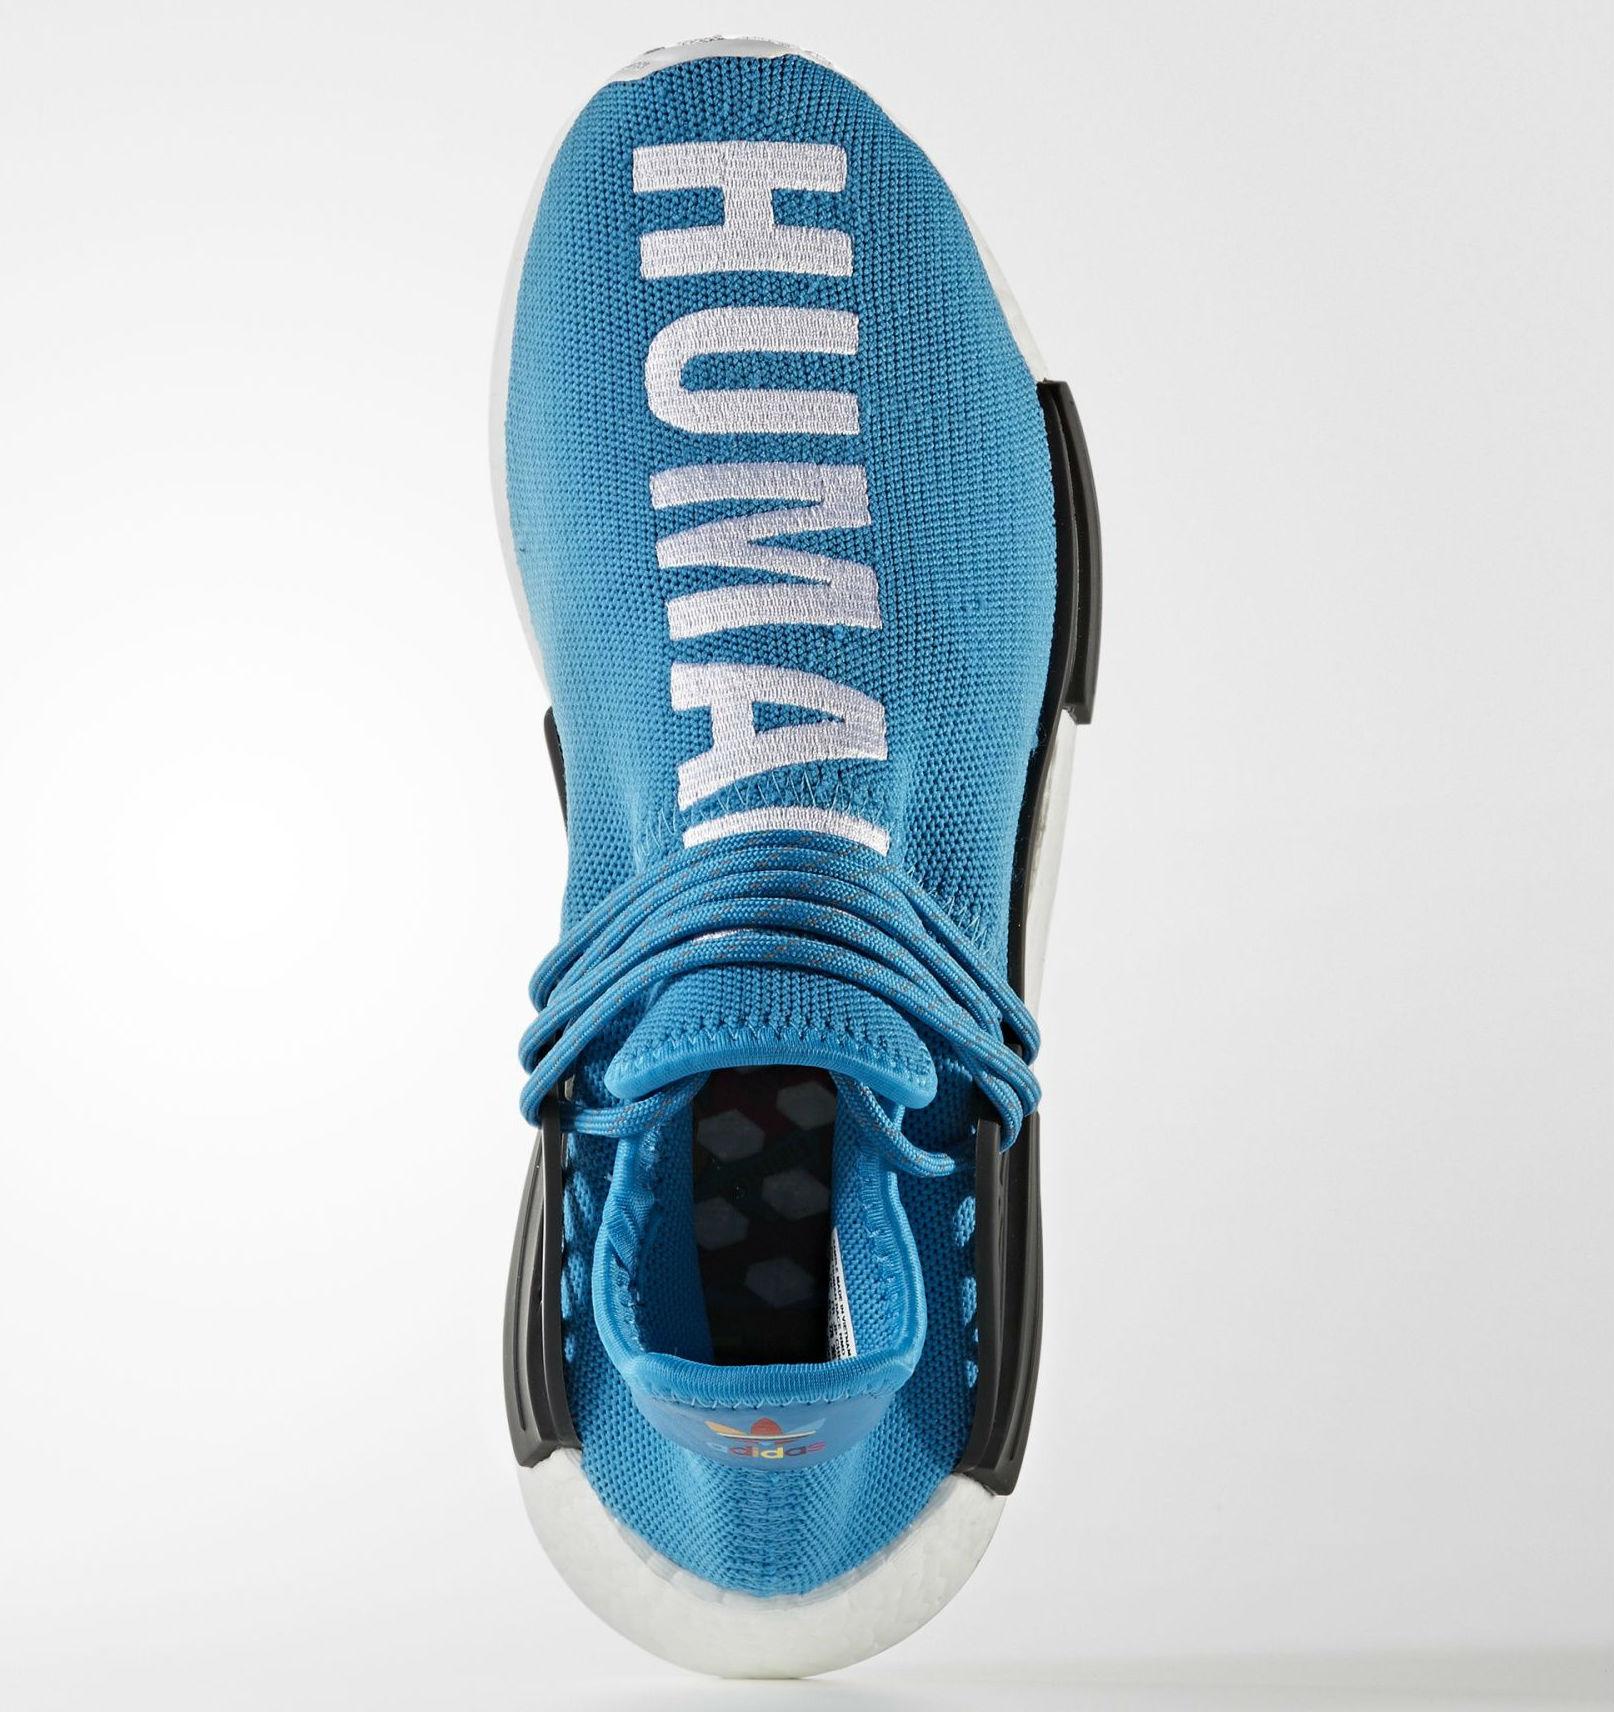 adidas nmd human race blue